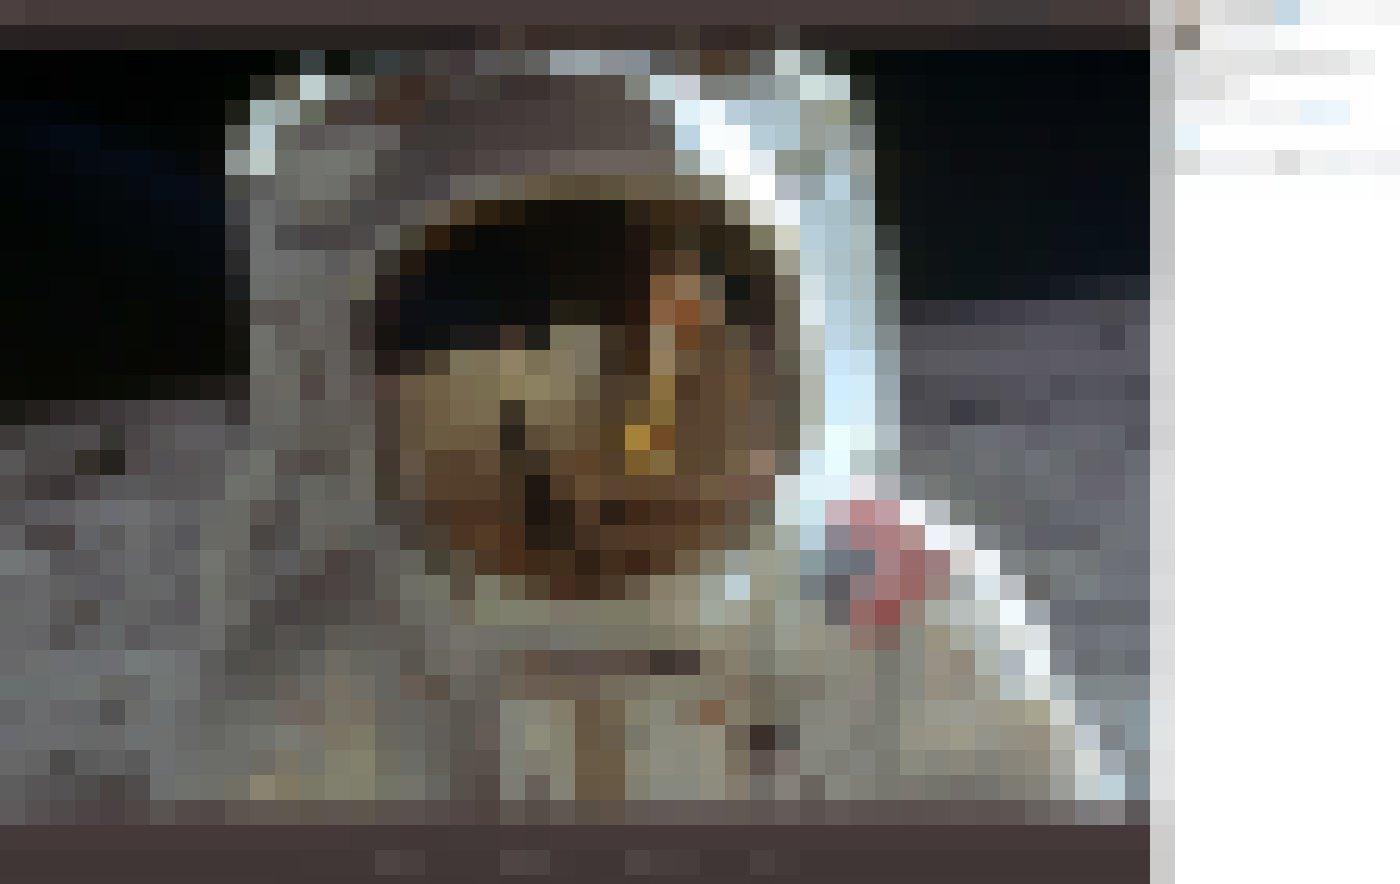 Buzz Aldrin, 1969fotografiert von Neil Armstrong auf dem Mond. We came in peace for all mankind.